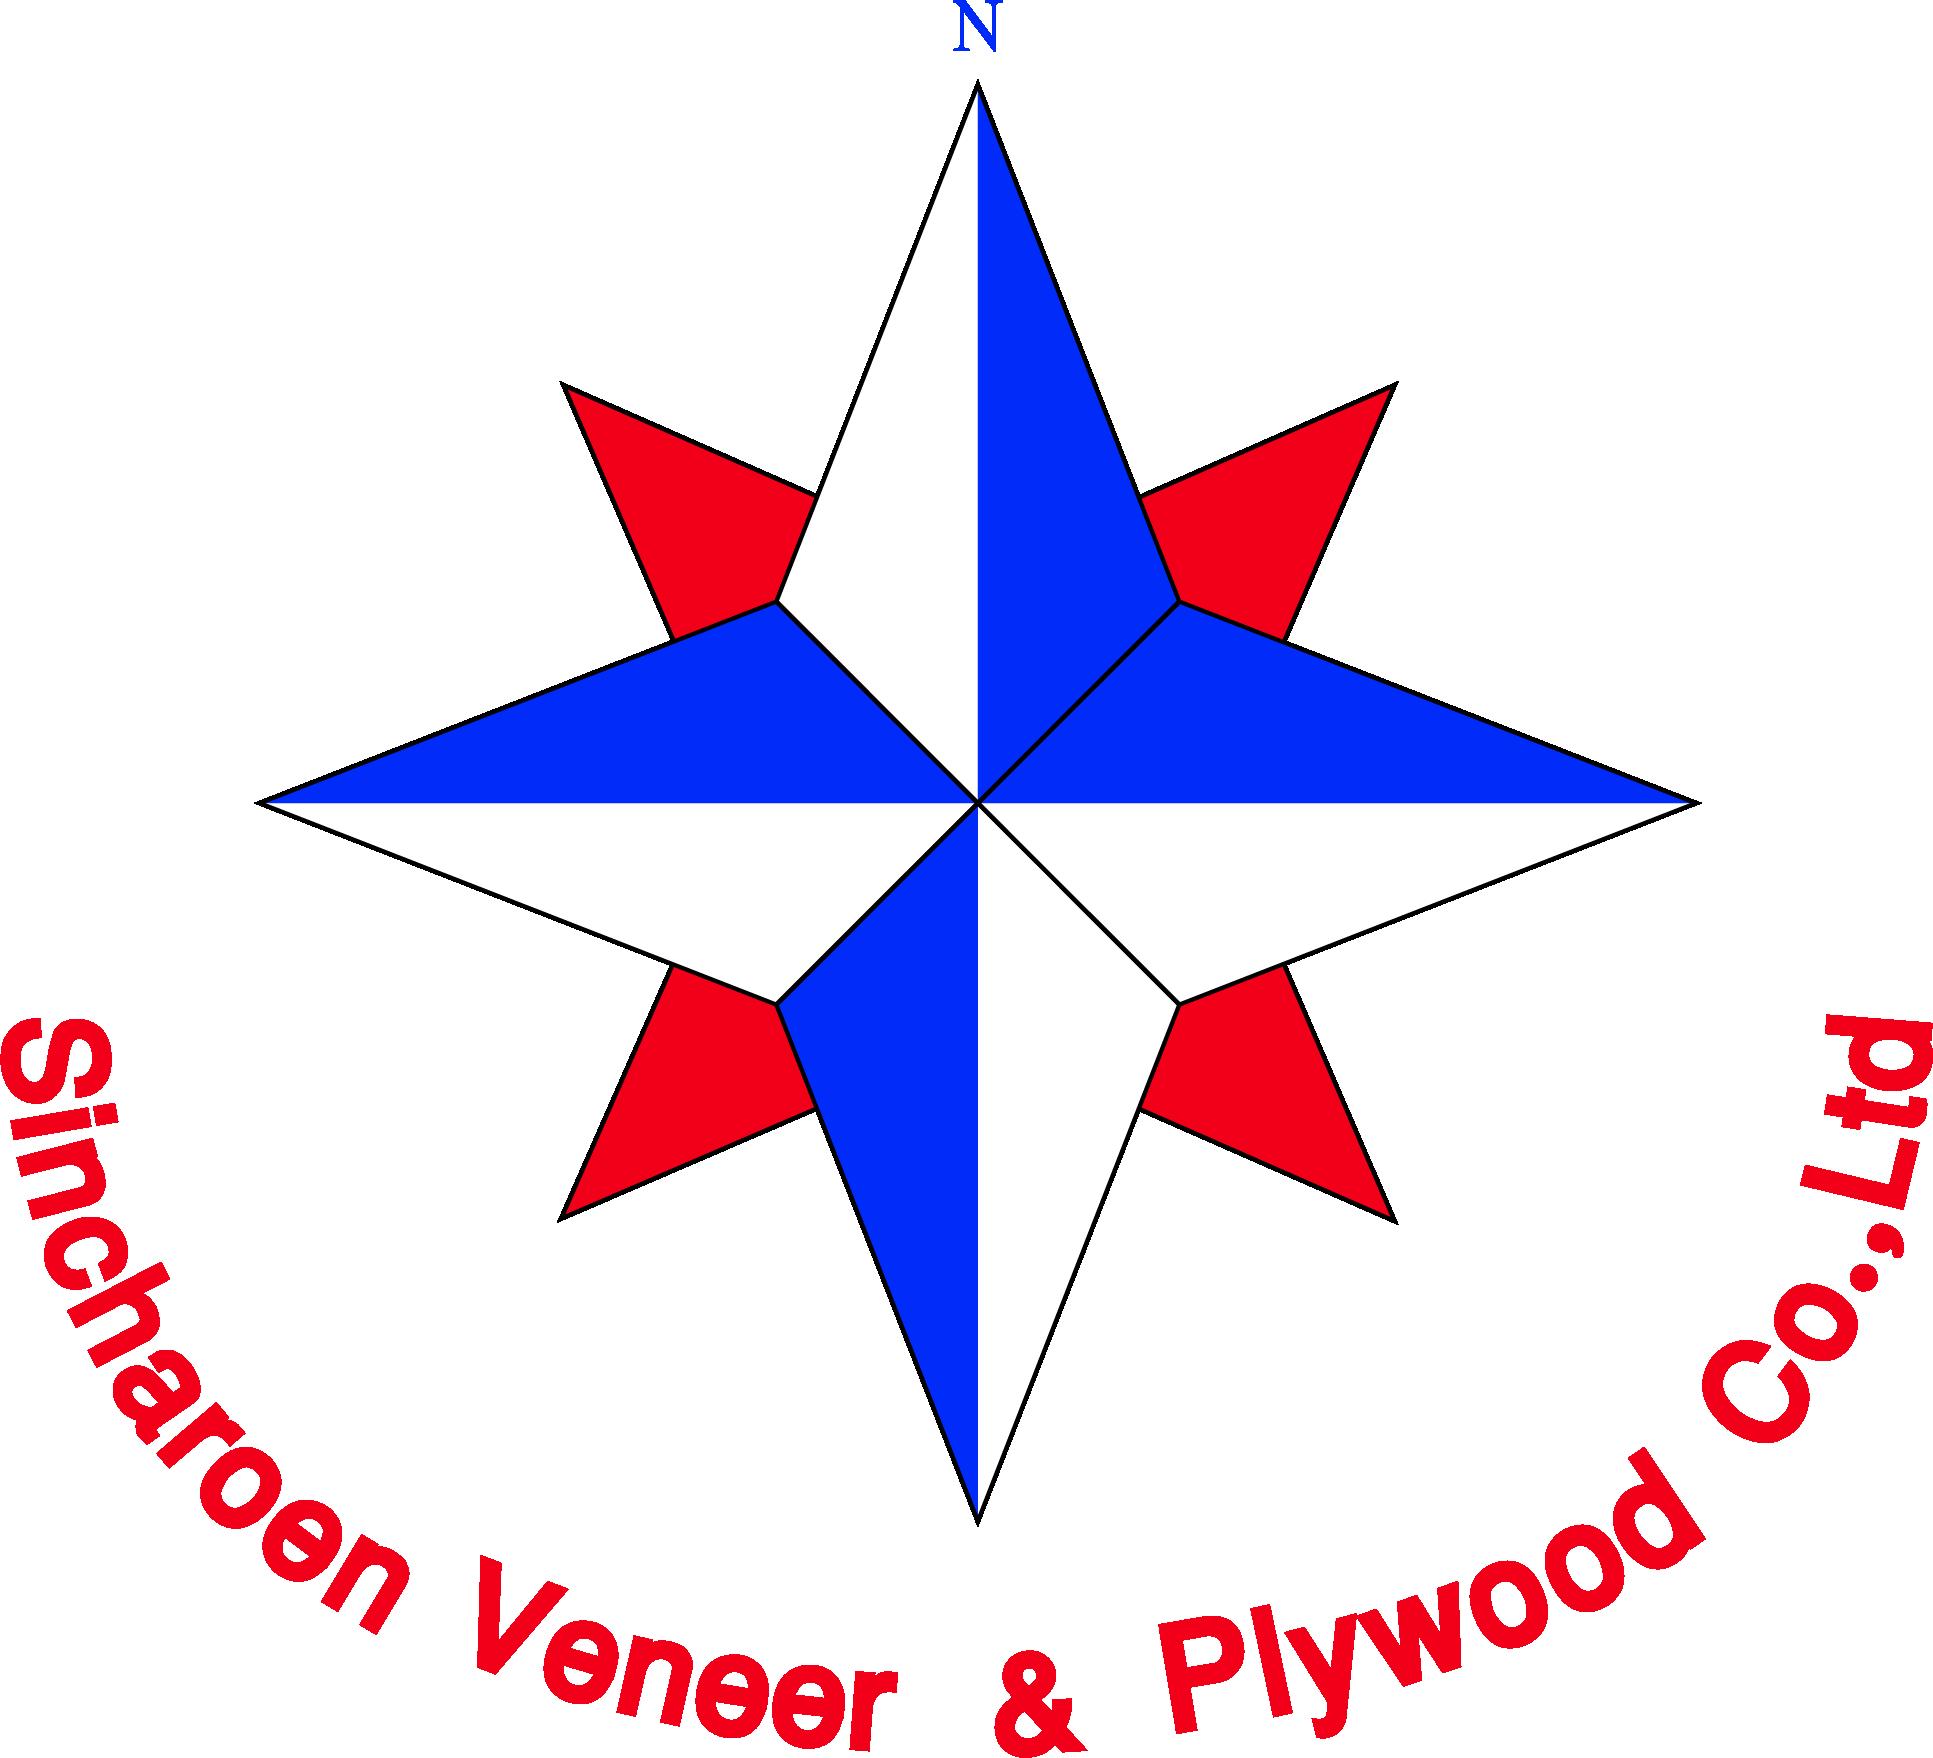 Sincharoen Veneer & Plywood Co., Ltd.